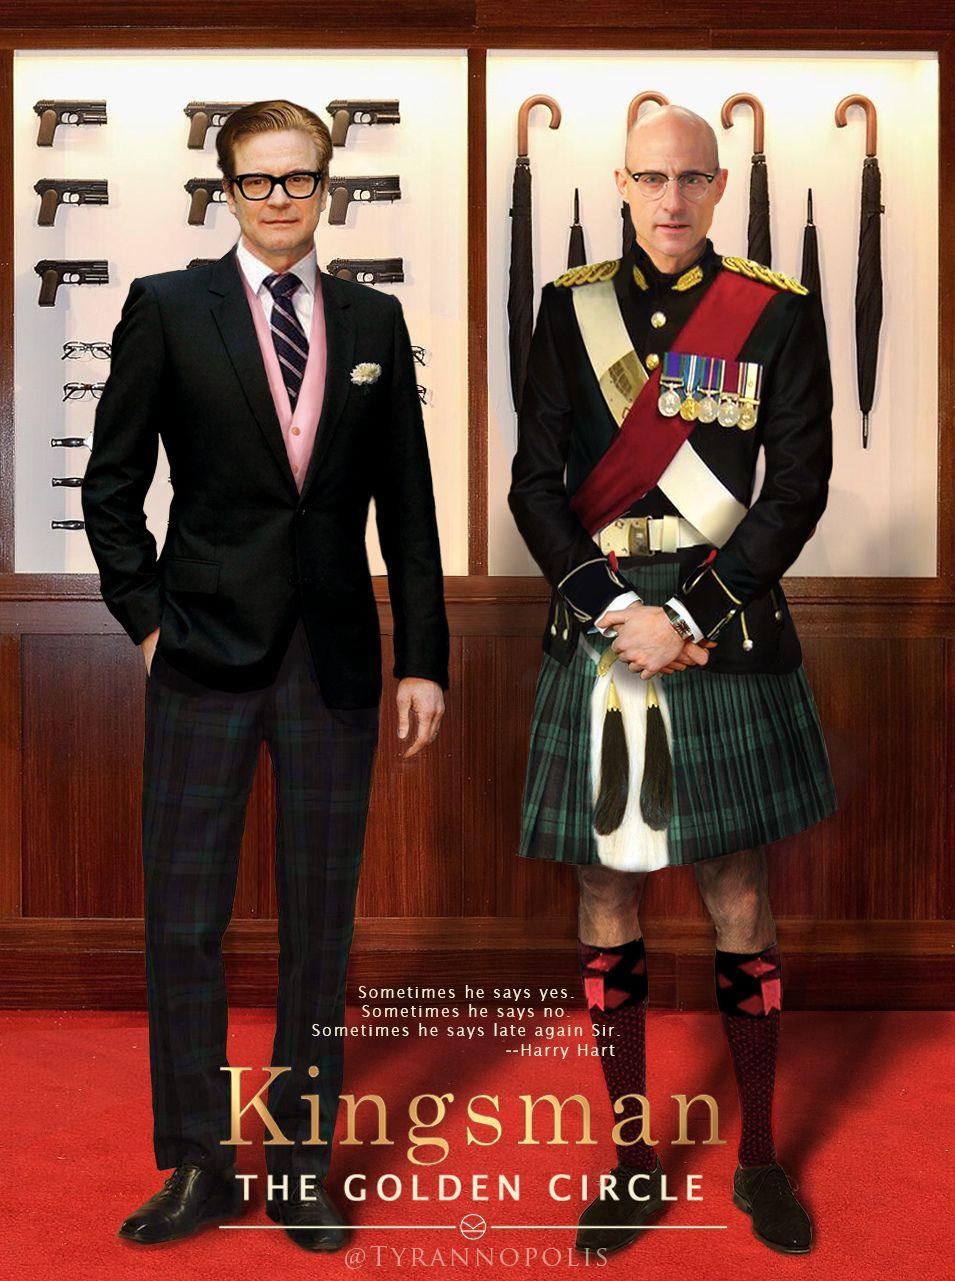 FIRTHISM Kingsman, Kingsman movie, Kingsman style